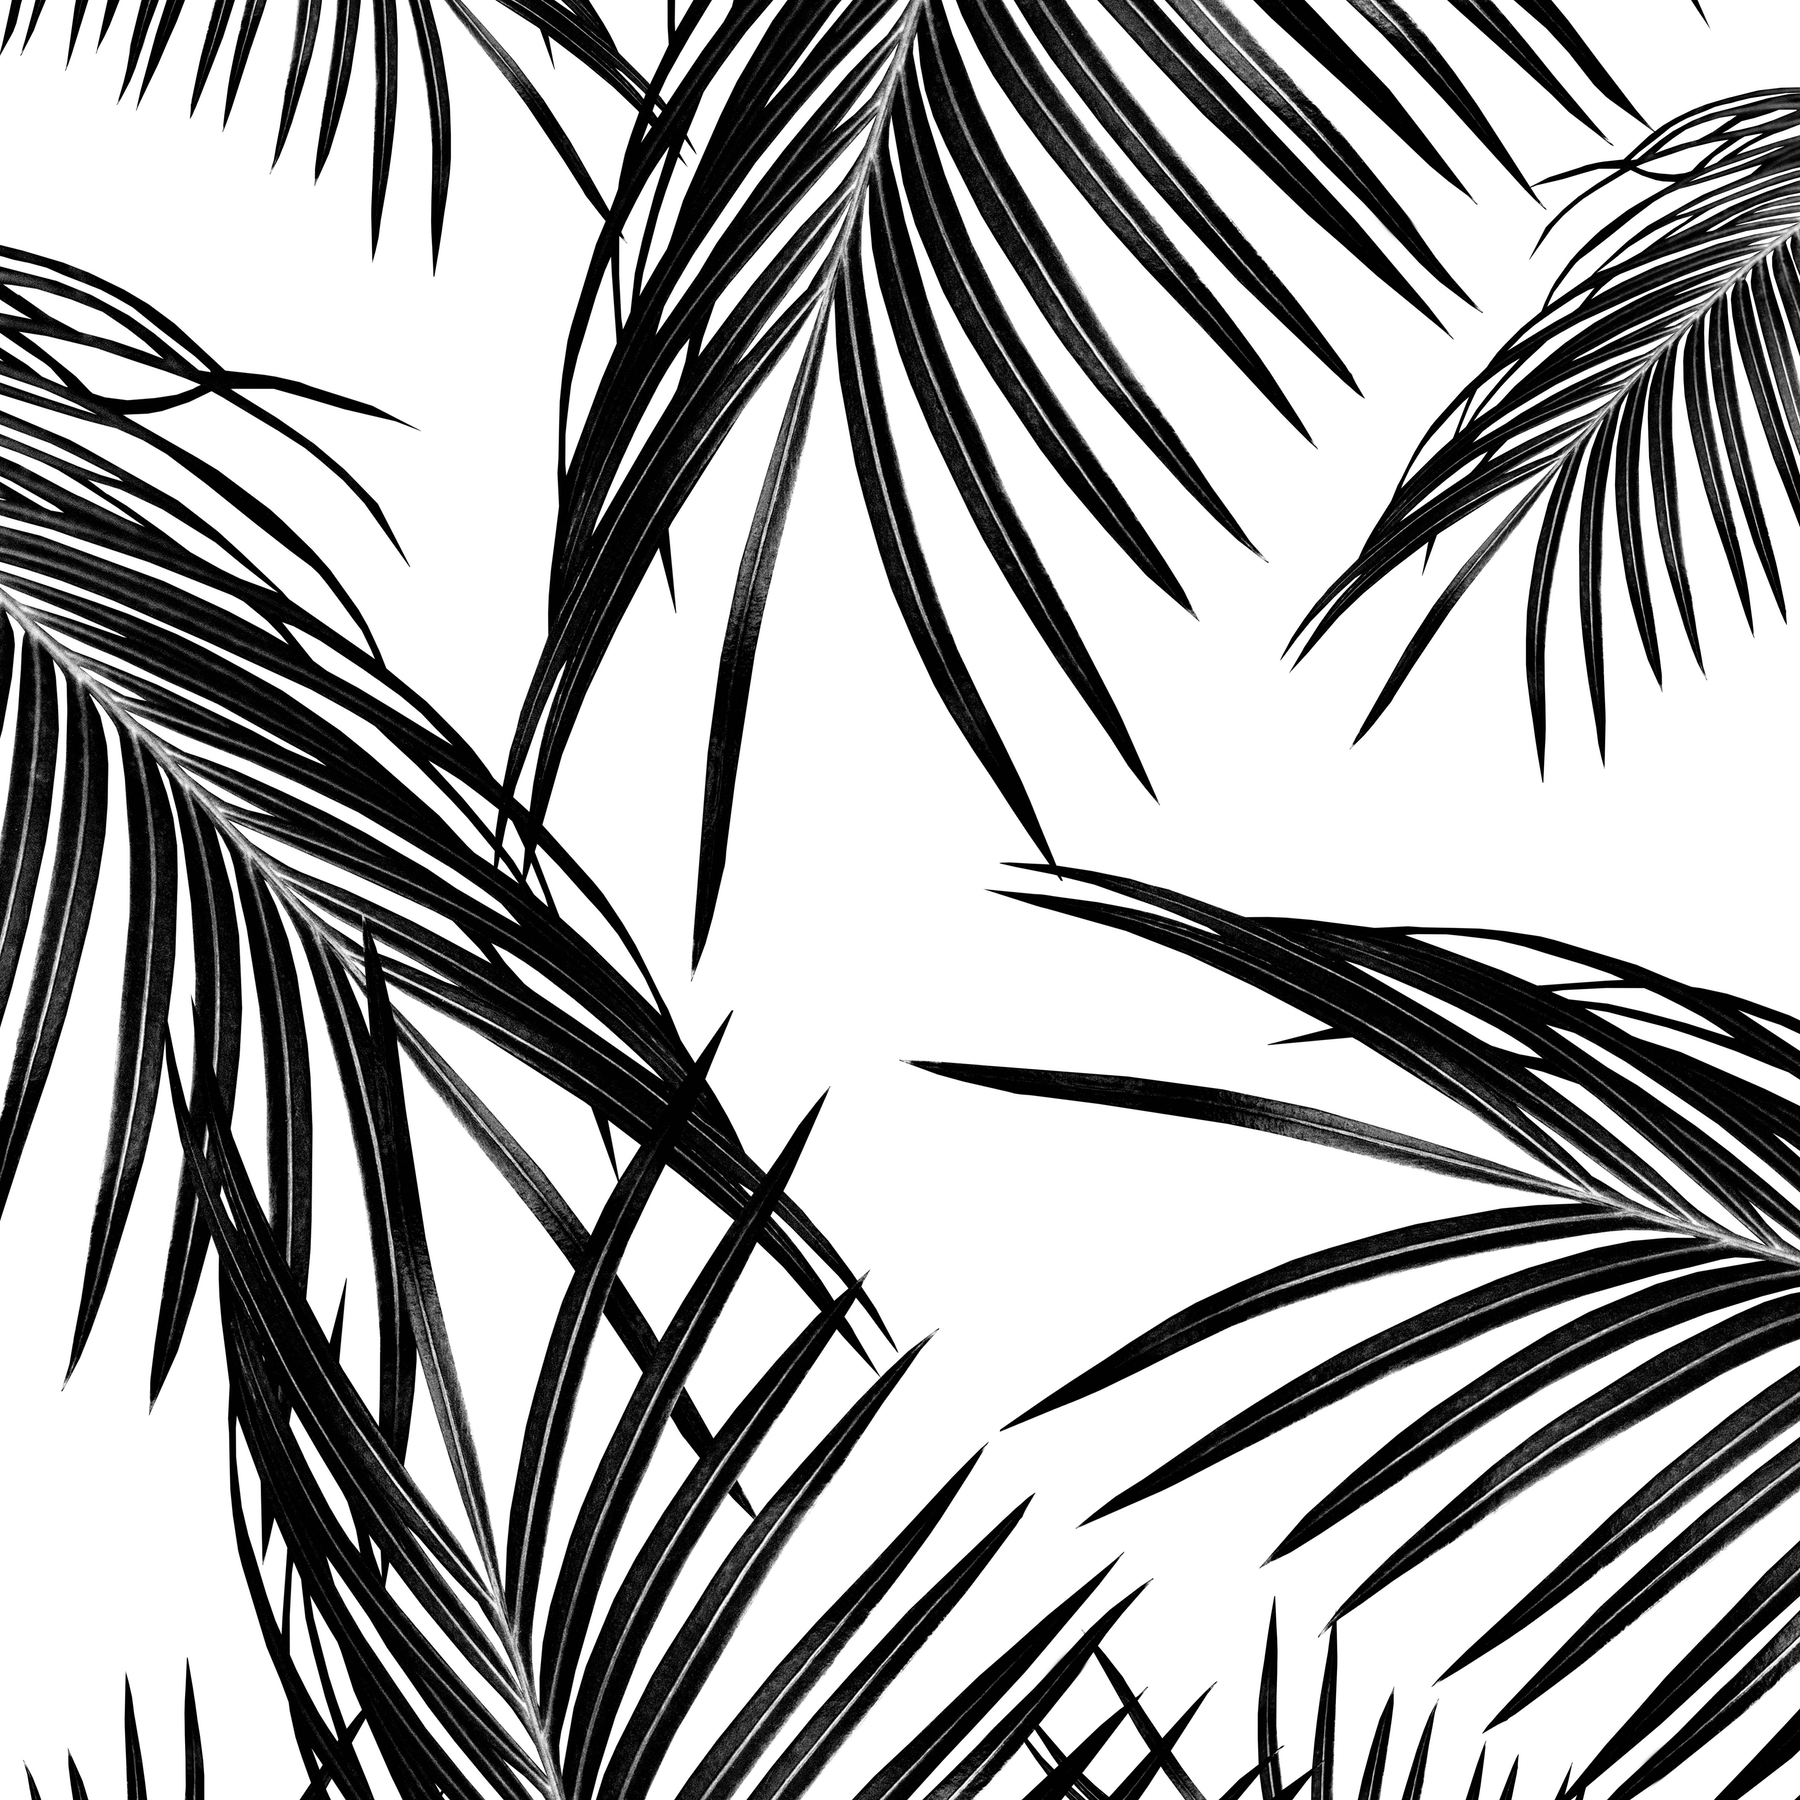 Buy Black Palm Leaves Dream 1 Wallpaper Free Us Shipping At Happywall Com